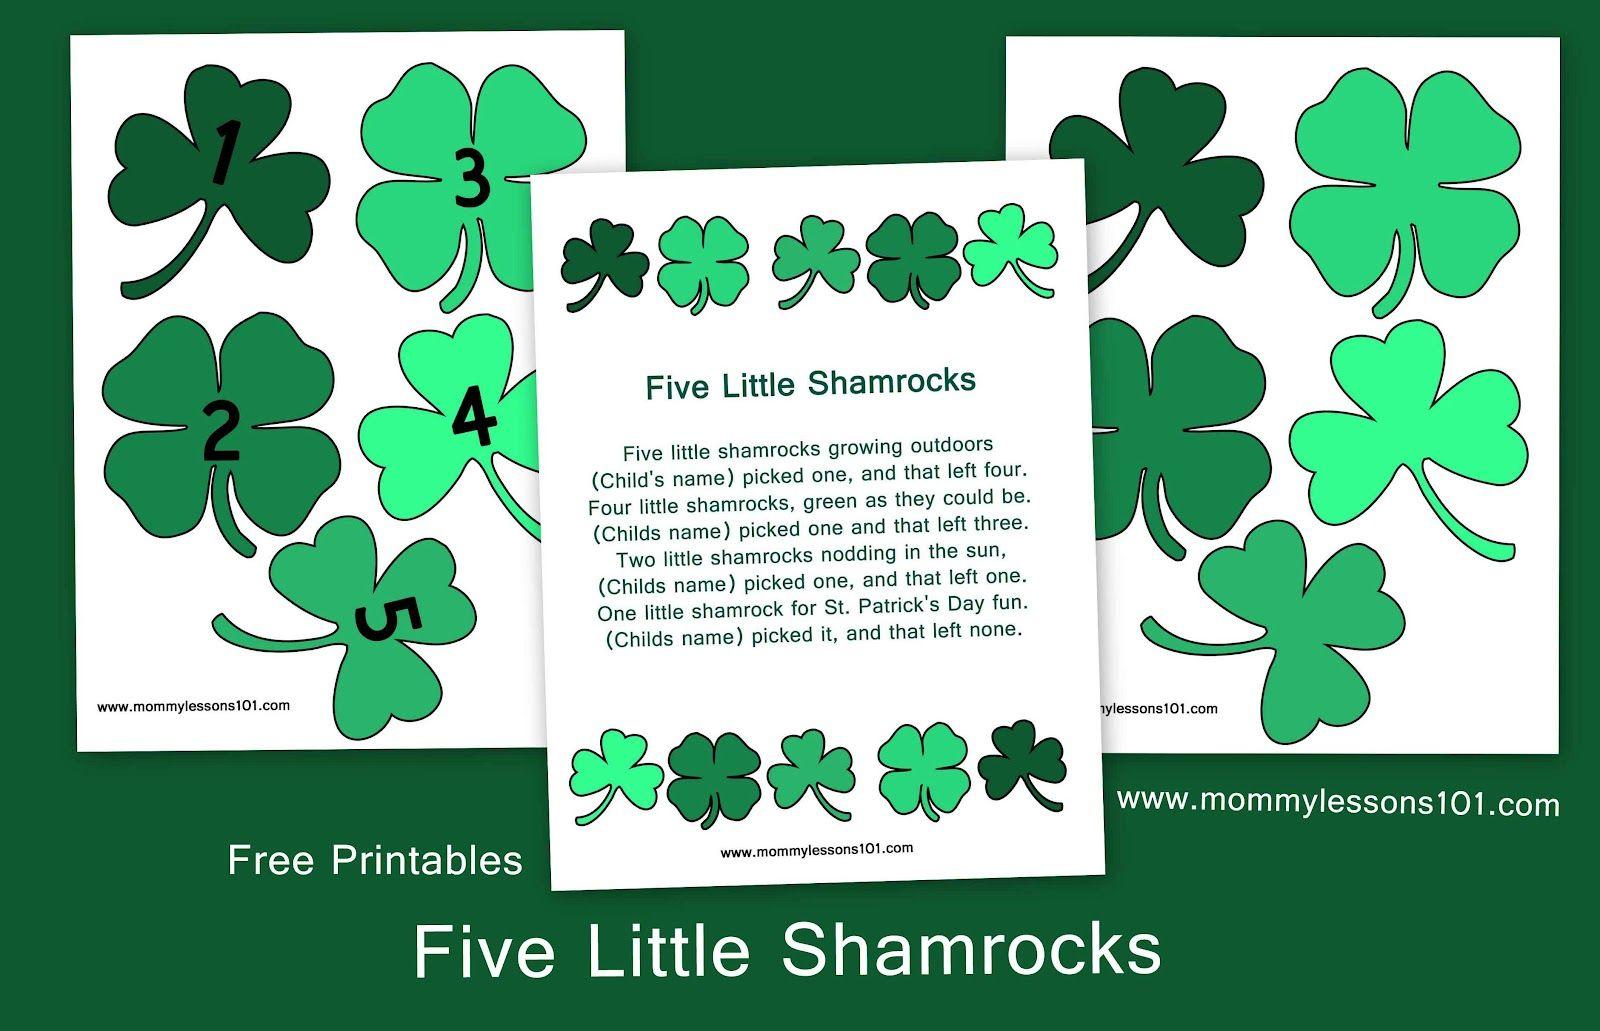 Mommy Lessons 101 Five Little Shamrocks Free